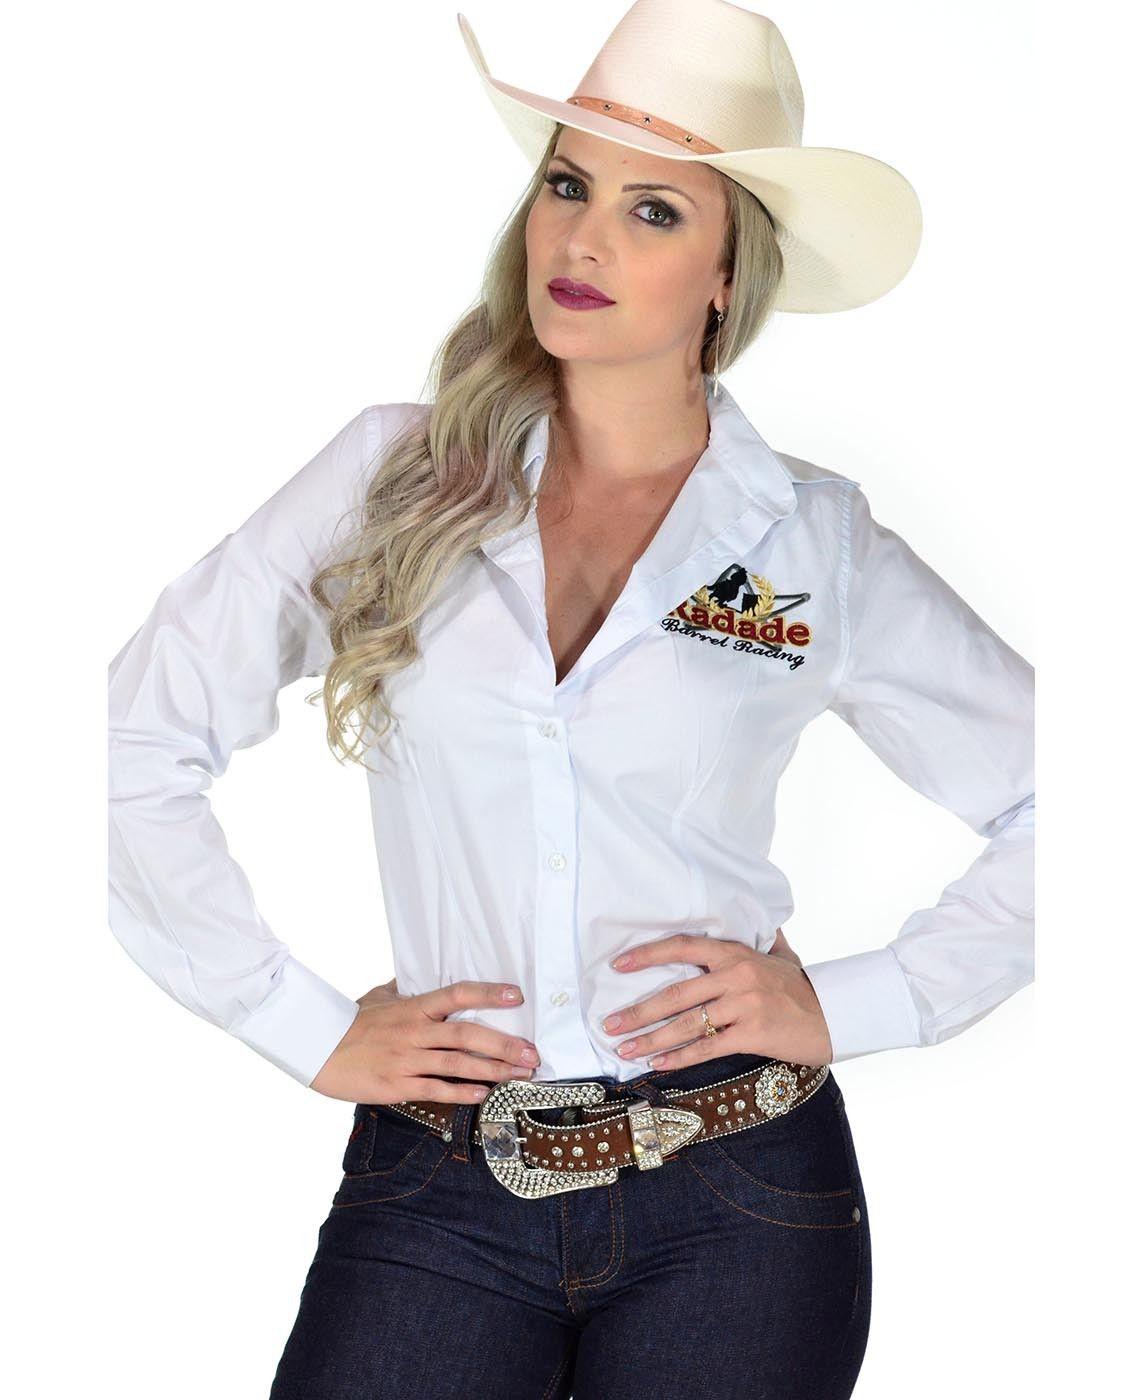 moda country feminina 2016 - Pesquisa Google  7c8c4c02e3f